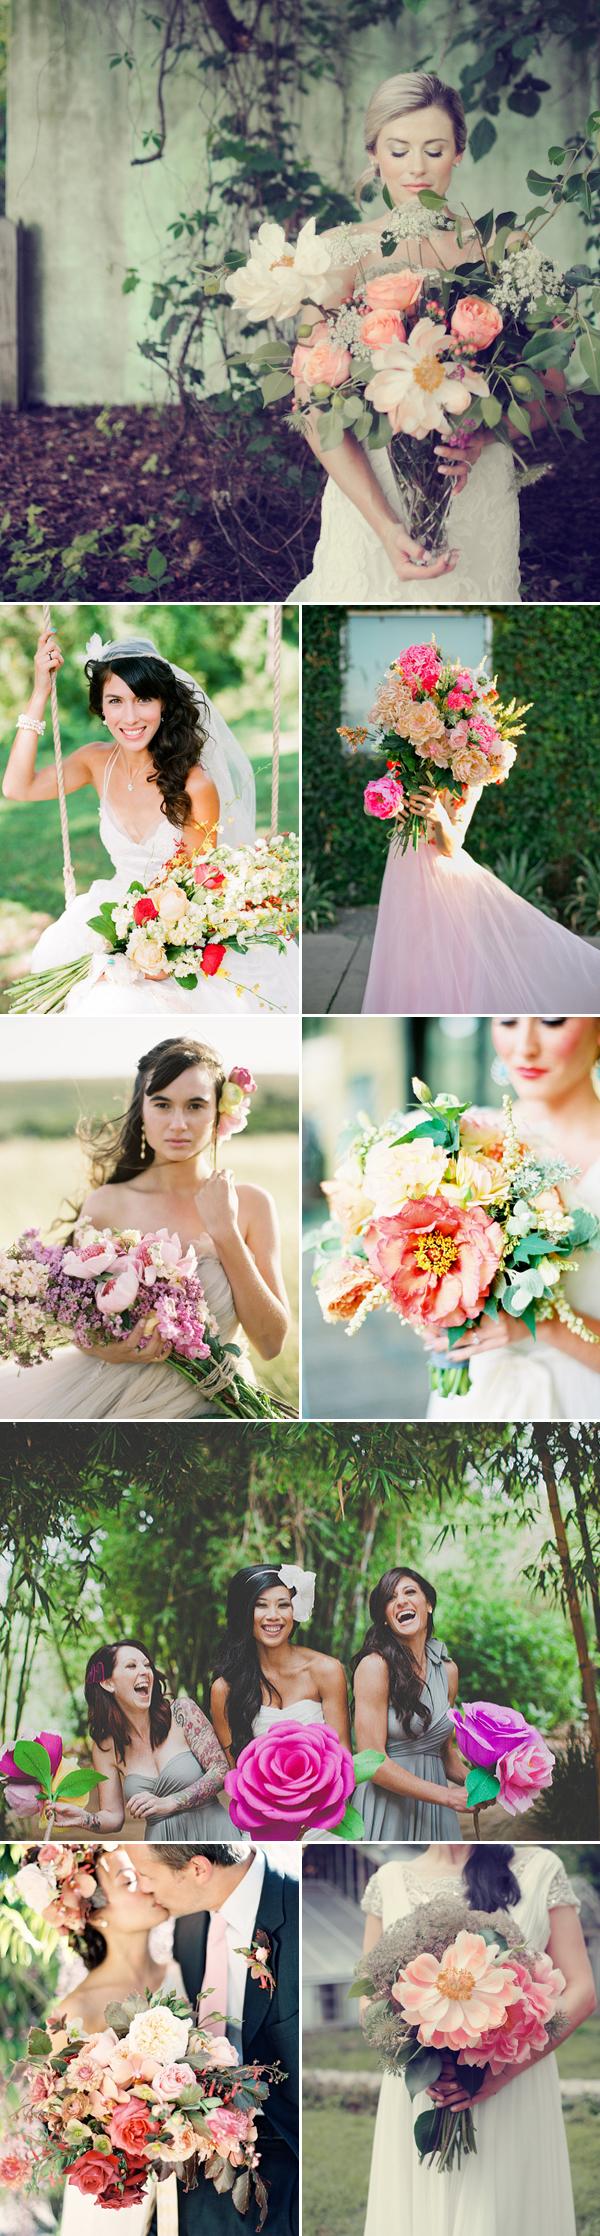 Oversized-bouquet01-passionate